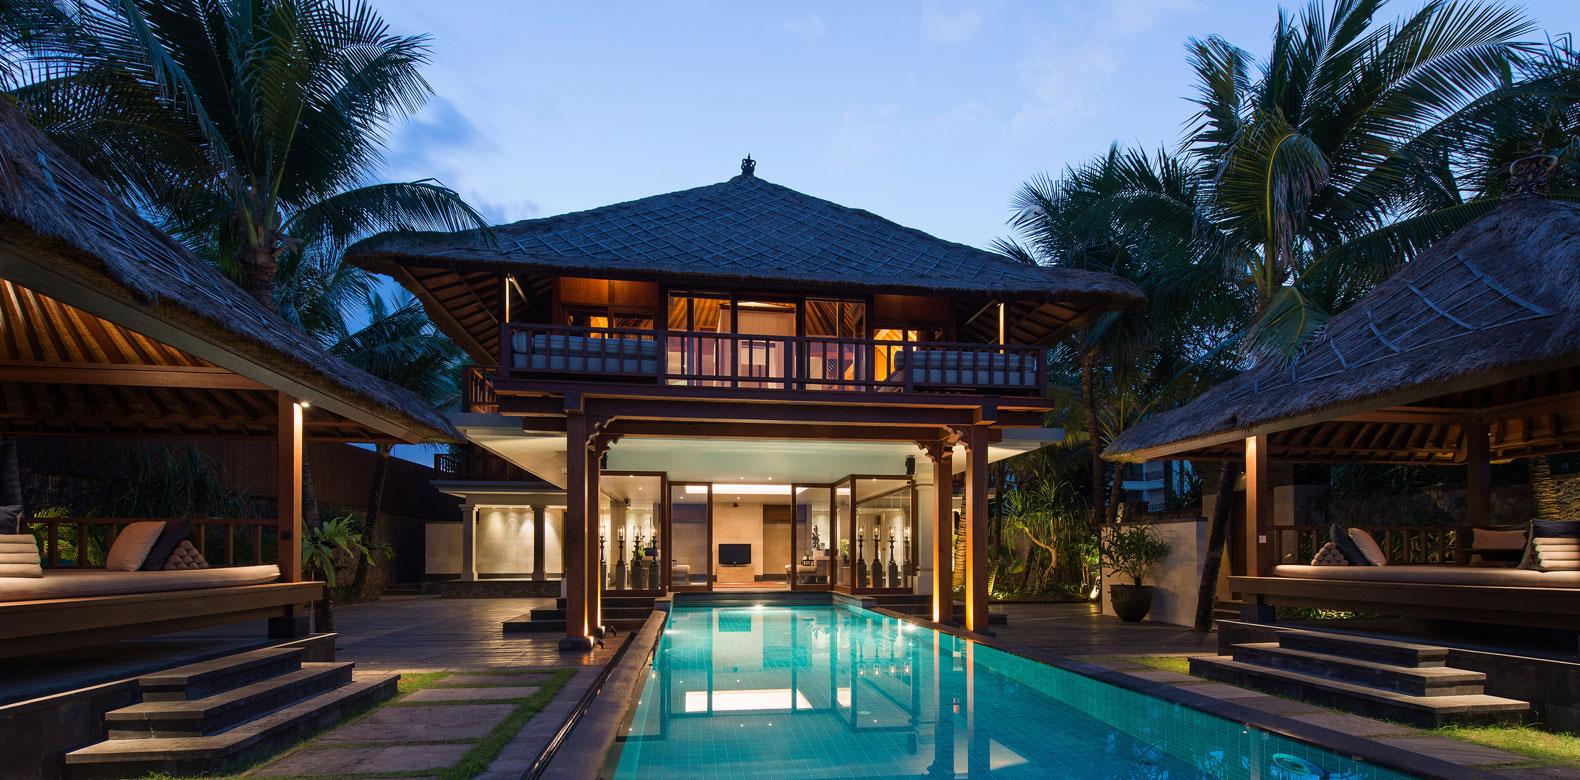 Exterior: 5 Beautiful Relaxing Beach Hotels For Your Honeymoon